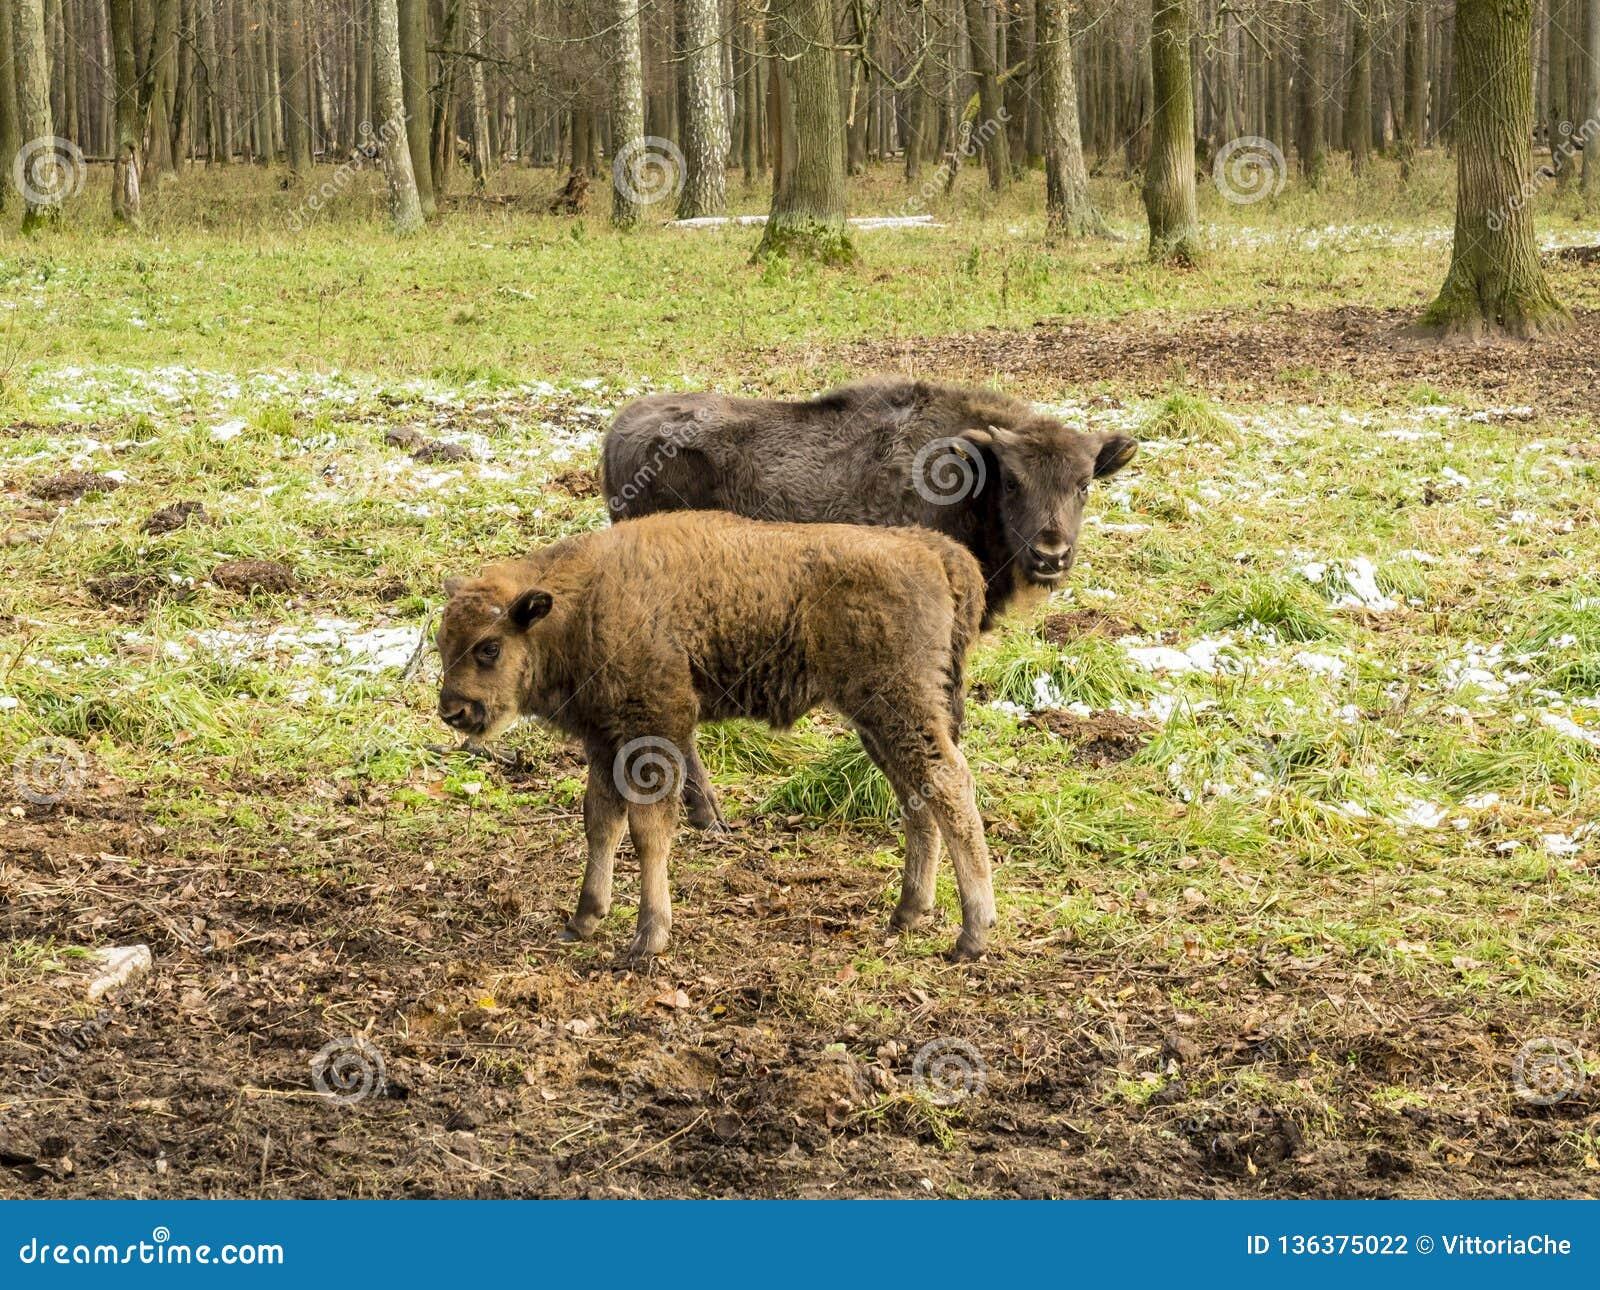 European bisons Bison bonasus, young animals, aurochs in the forest